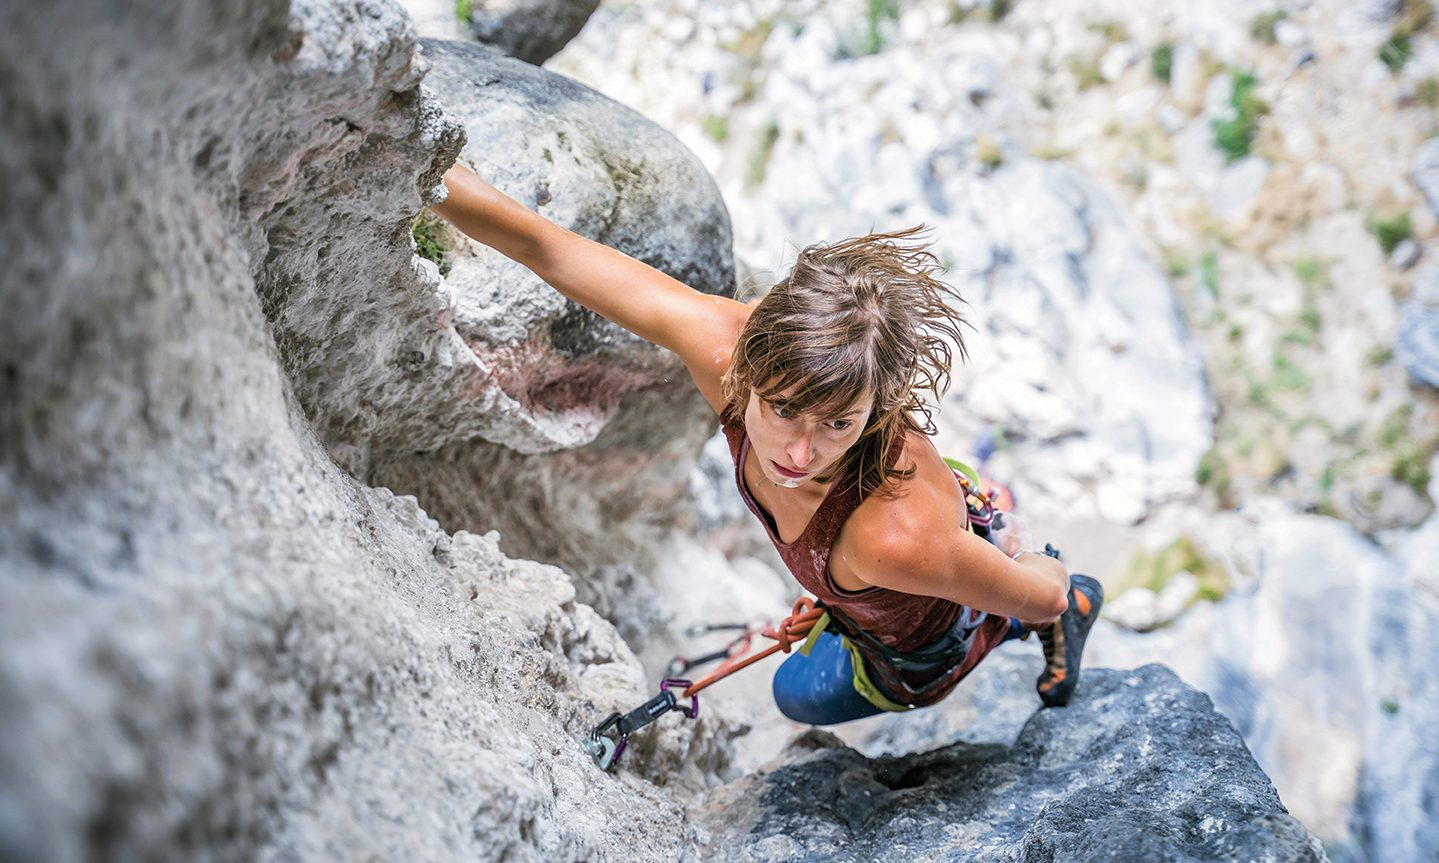 Climb X E-Motion High Performance Rock Climbing//Bouldering Shoe 2020